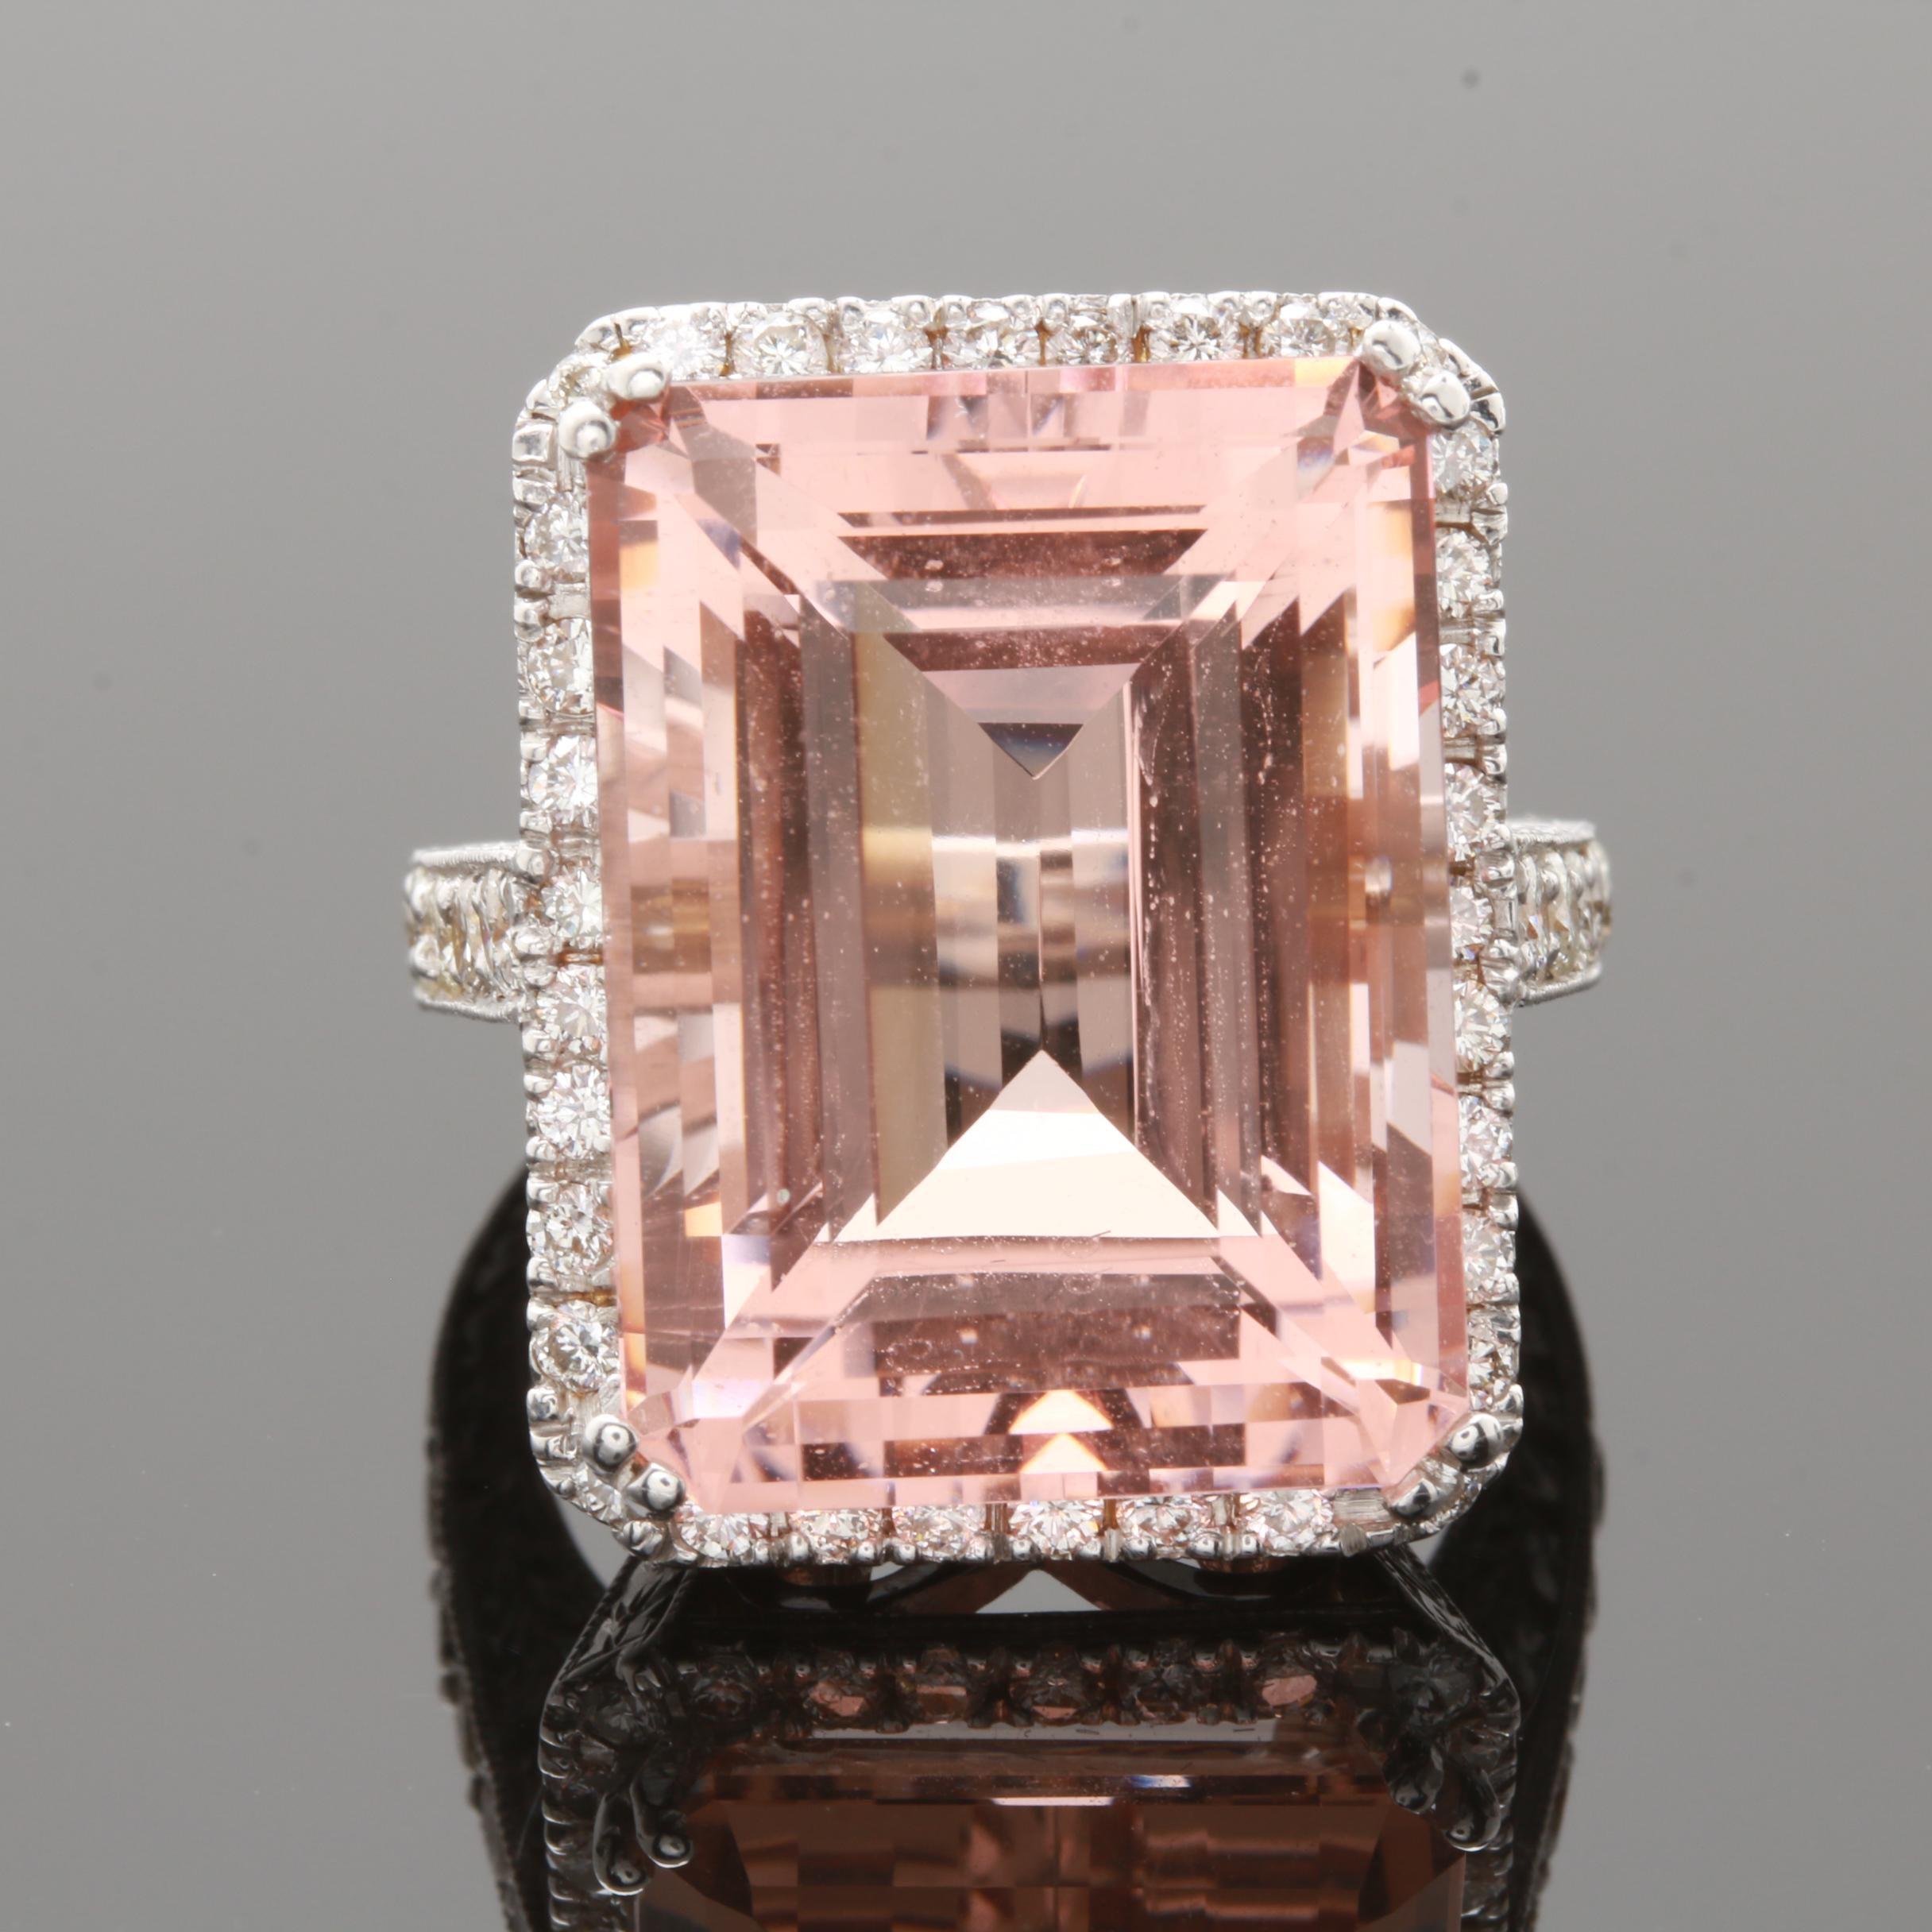 18K White Gold 21.27 CT Morganite and 1.22 CTW Diamond Ring